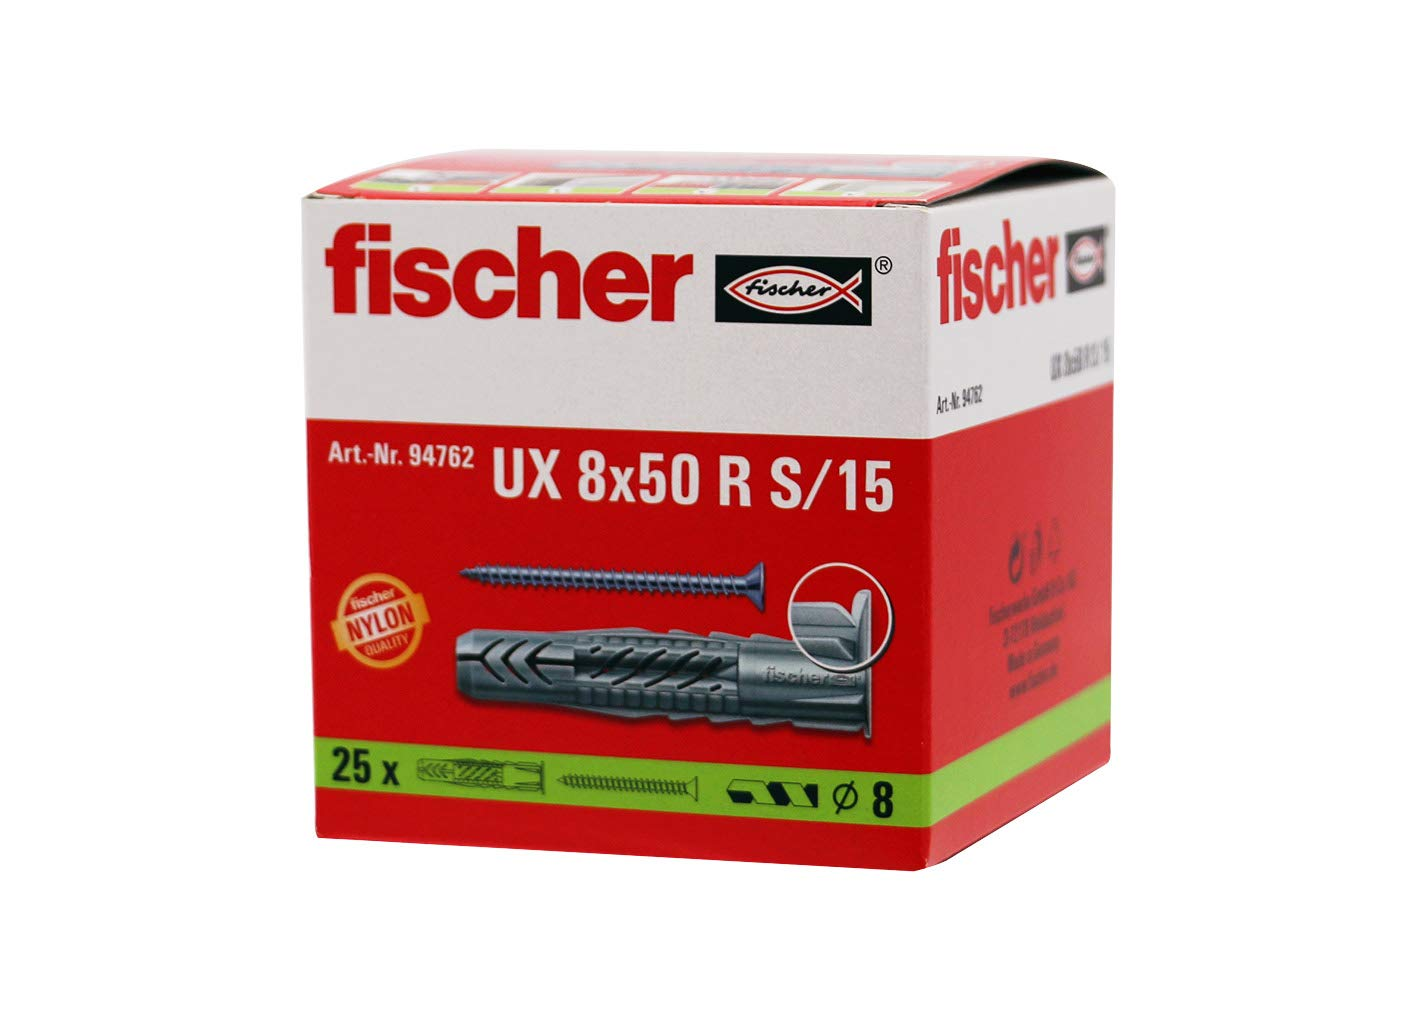 Fischer 094762 8 x 50 mm UX-R S/15 Universal Plug - Zinc (25-Piece)